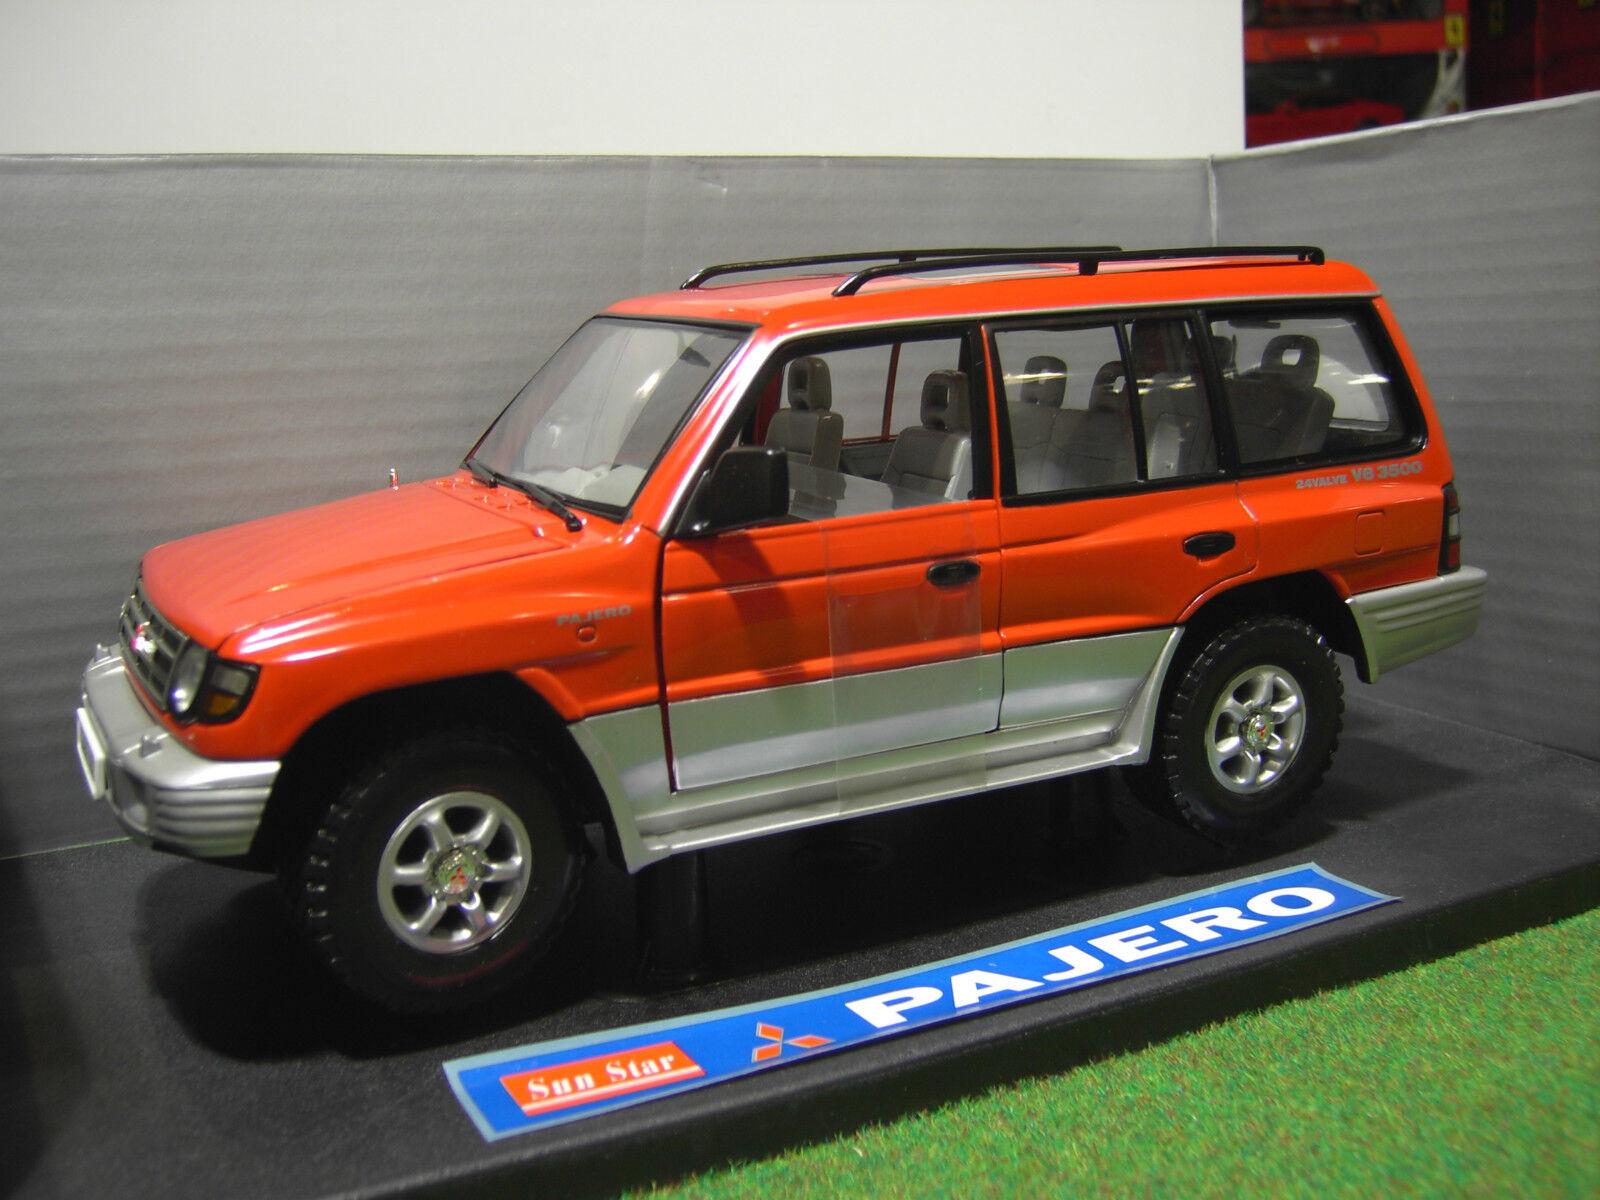 MITSUBISHI PAJERO 4X4 LONG 98 ( european ) 1 18 voiture miniature SUN STAR 1211